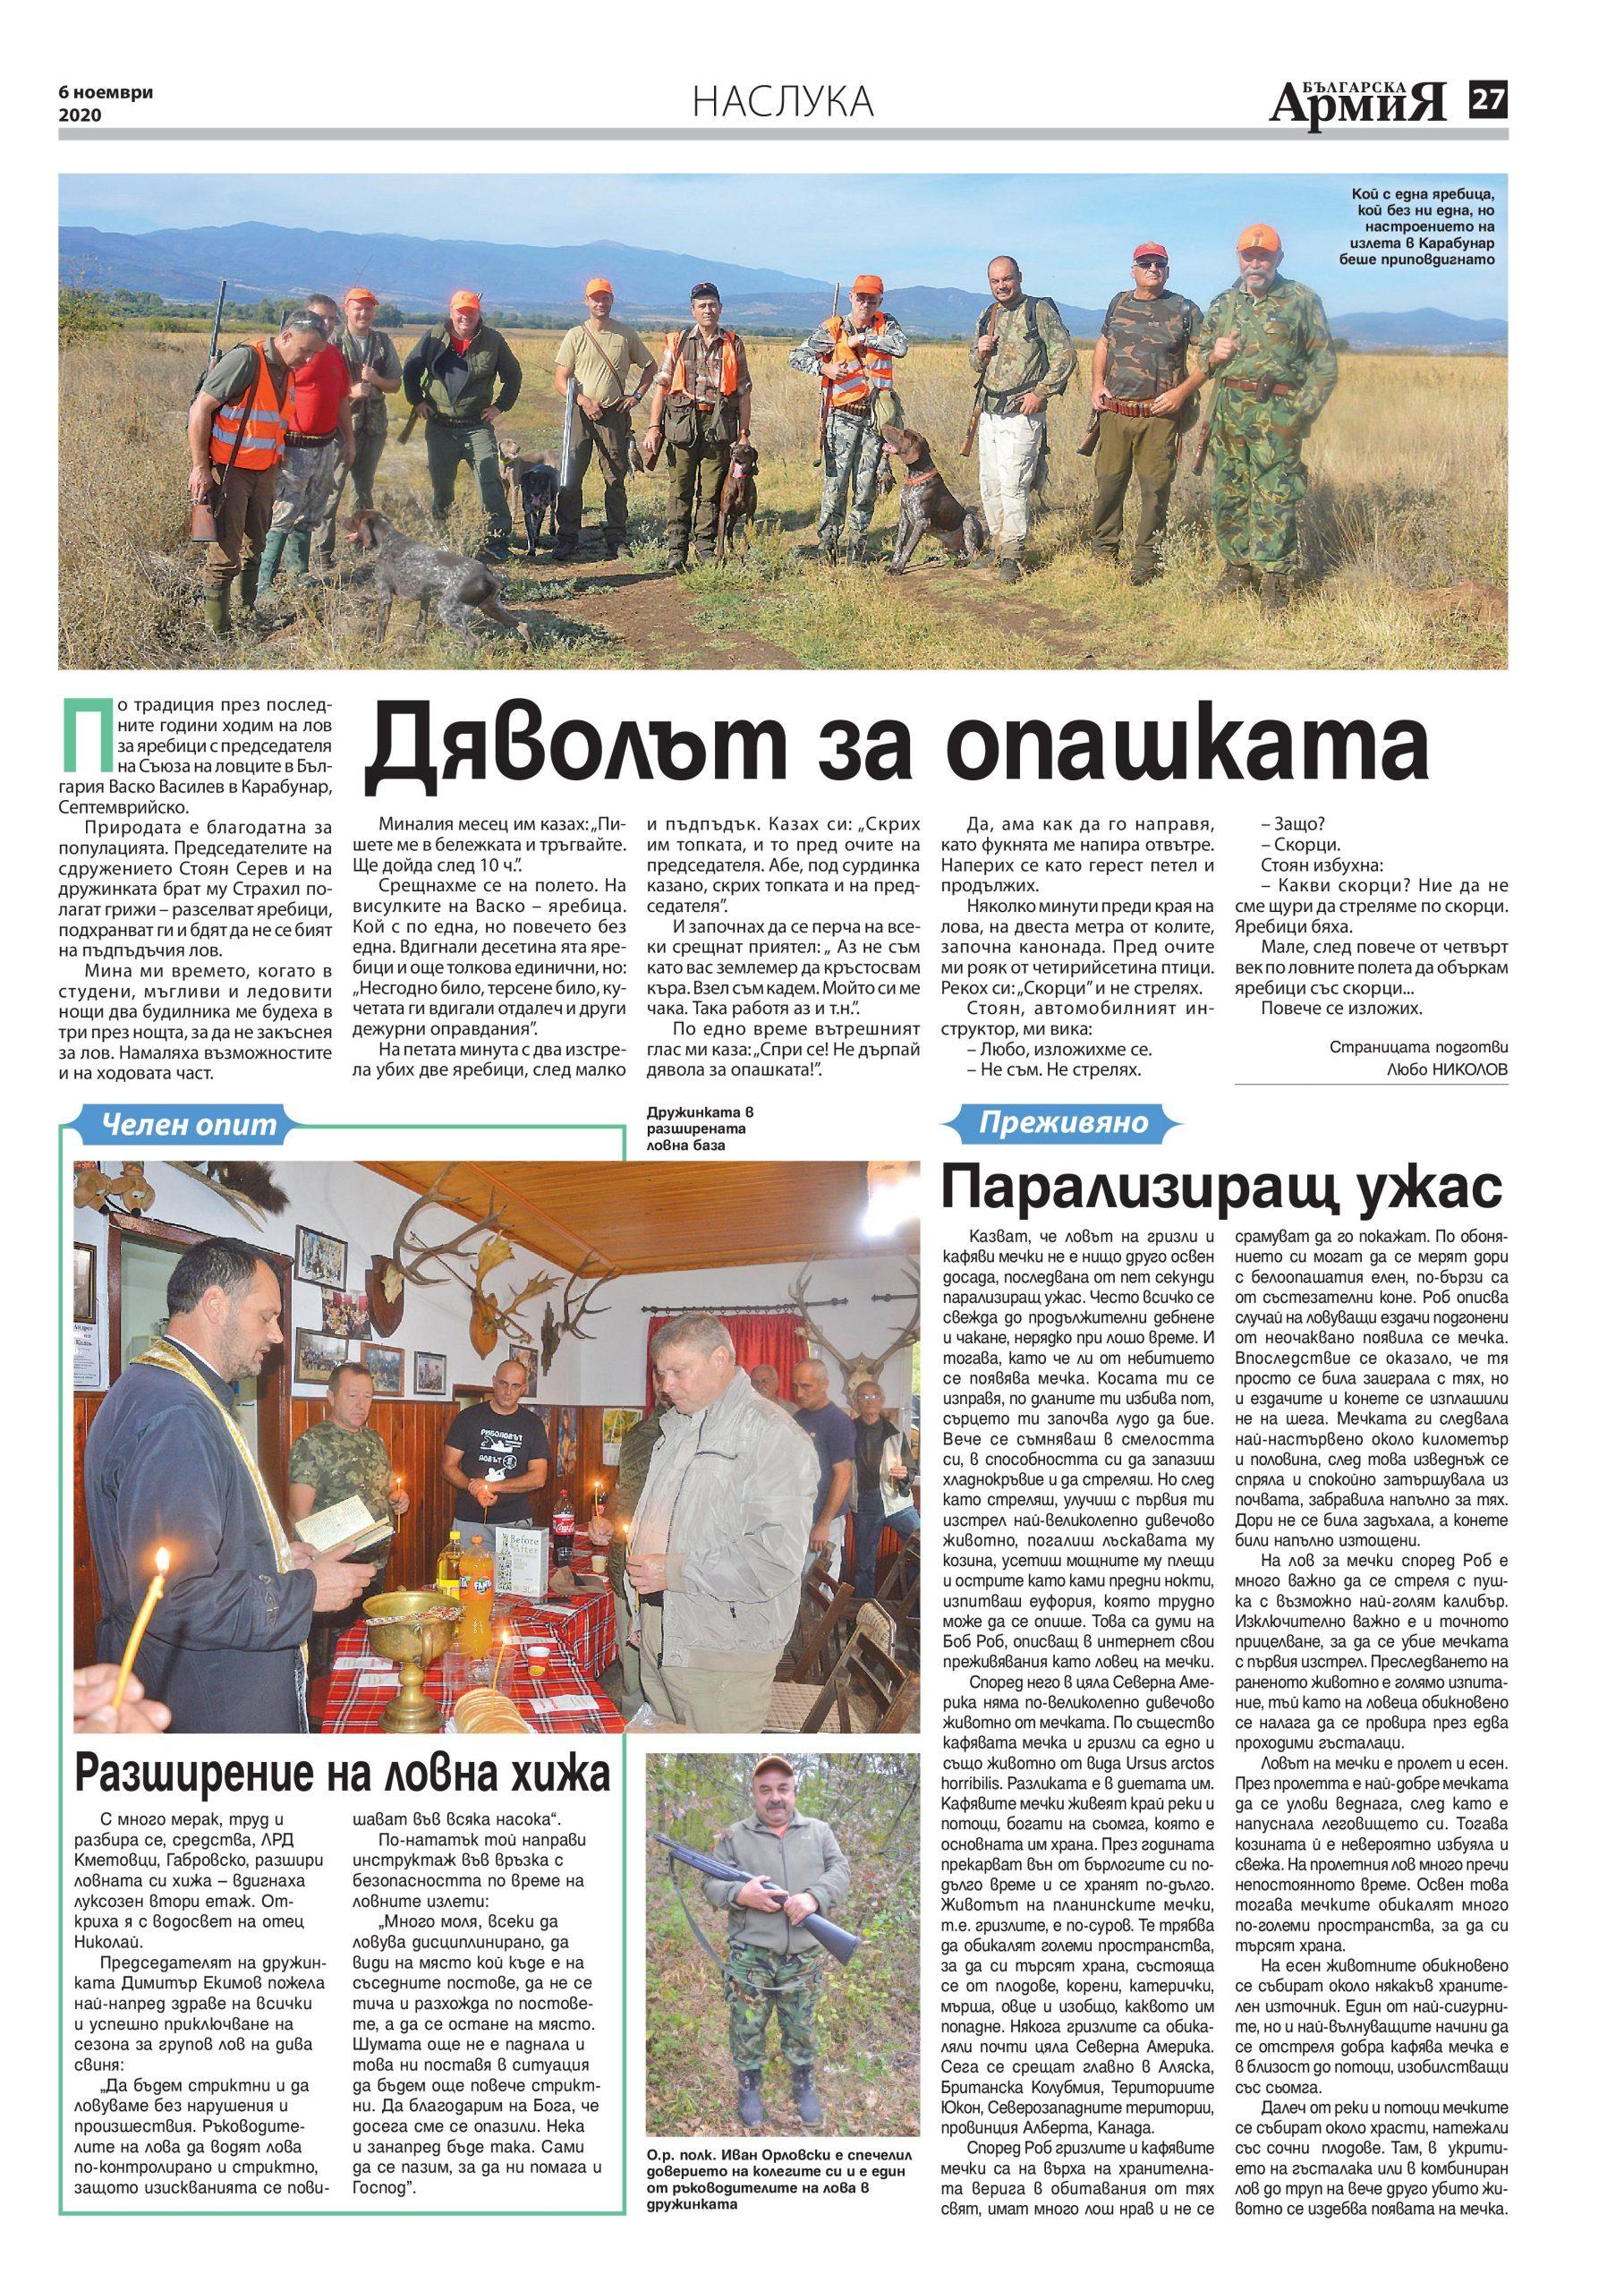 https://armymedia.bg/wp-content/uploads/2015/06/27-39-scaled.jpg